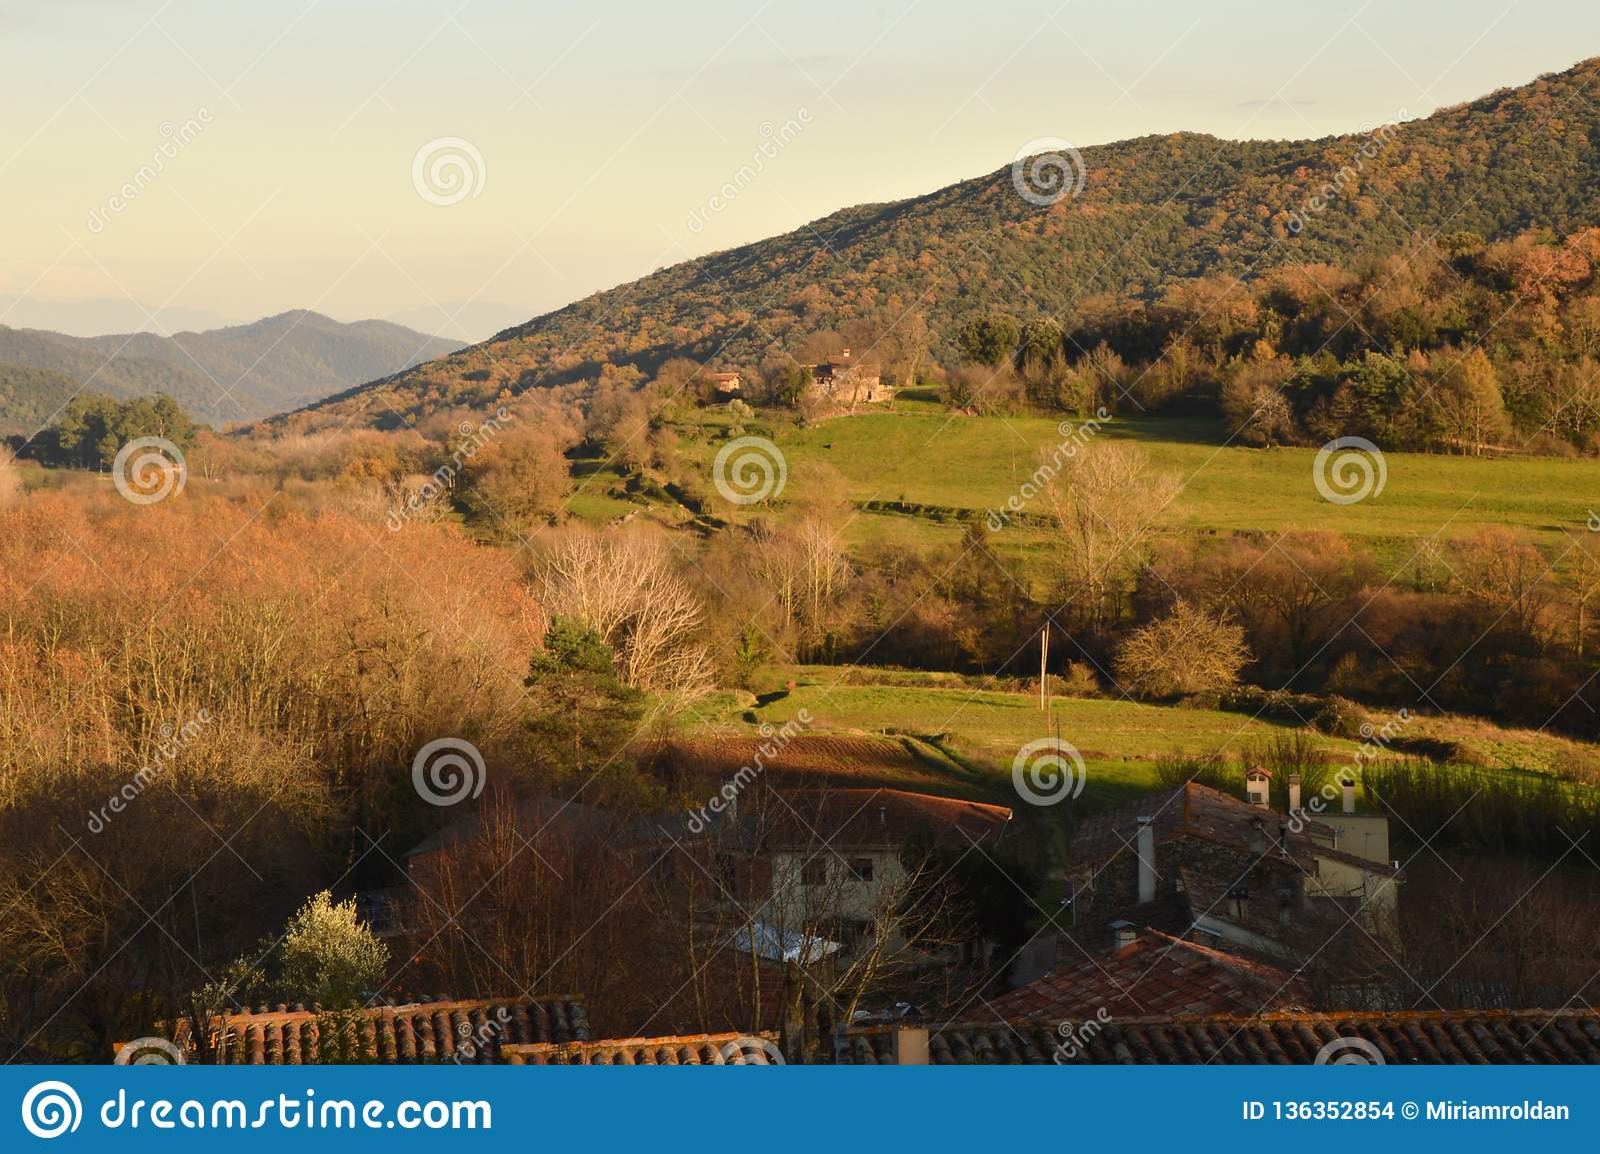 Views from Santa Pau